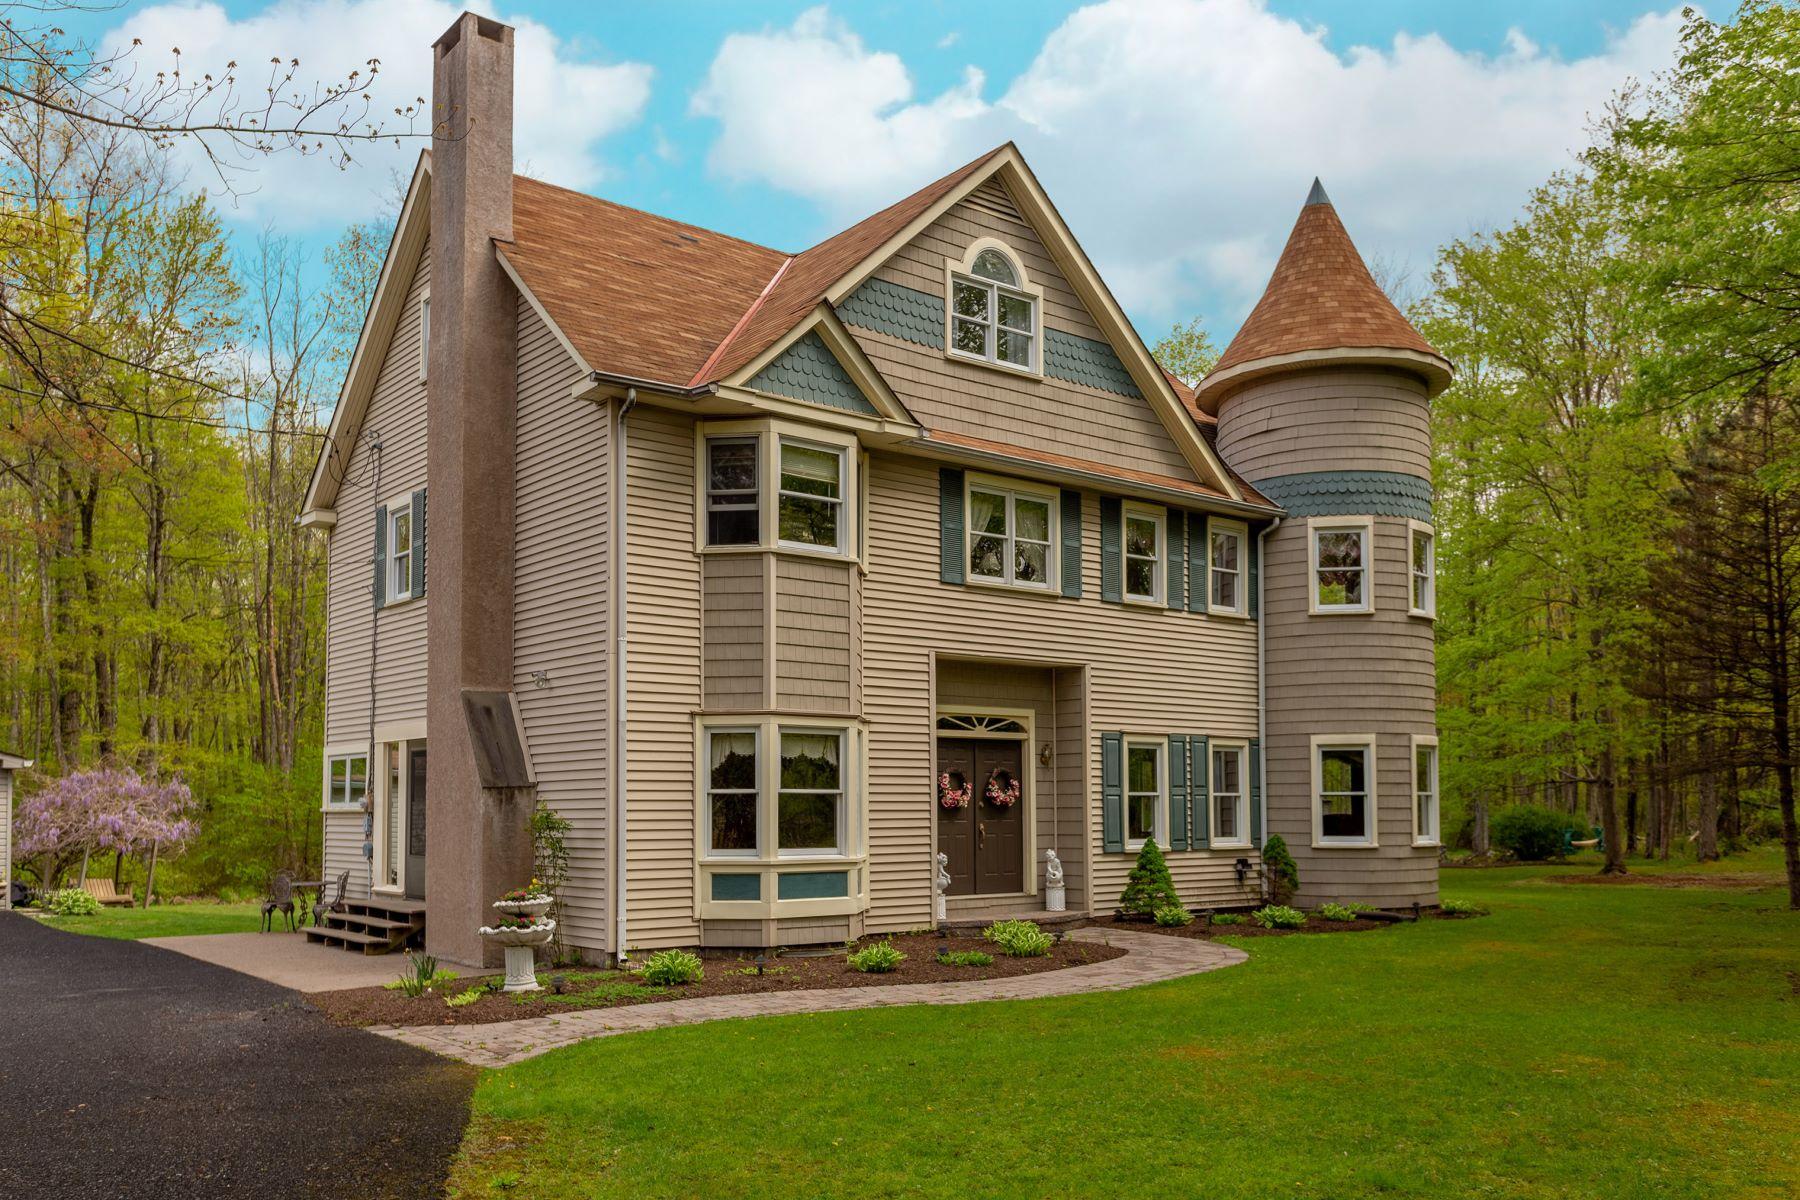 Single Family Homes for Sale at 1023 BRIDGETON HILL RD Upper Black Eddy, Pennsylvania 18972 United States